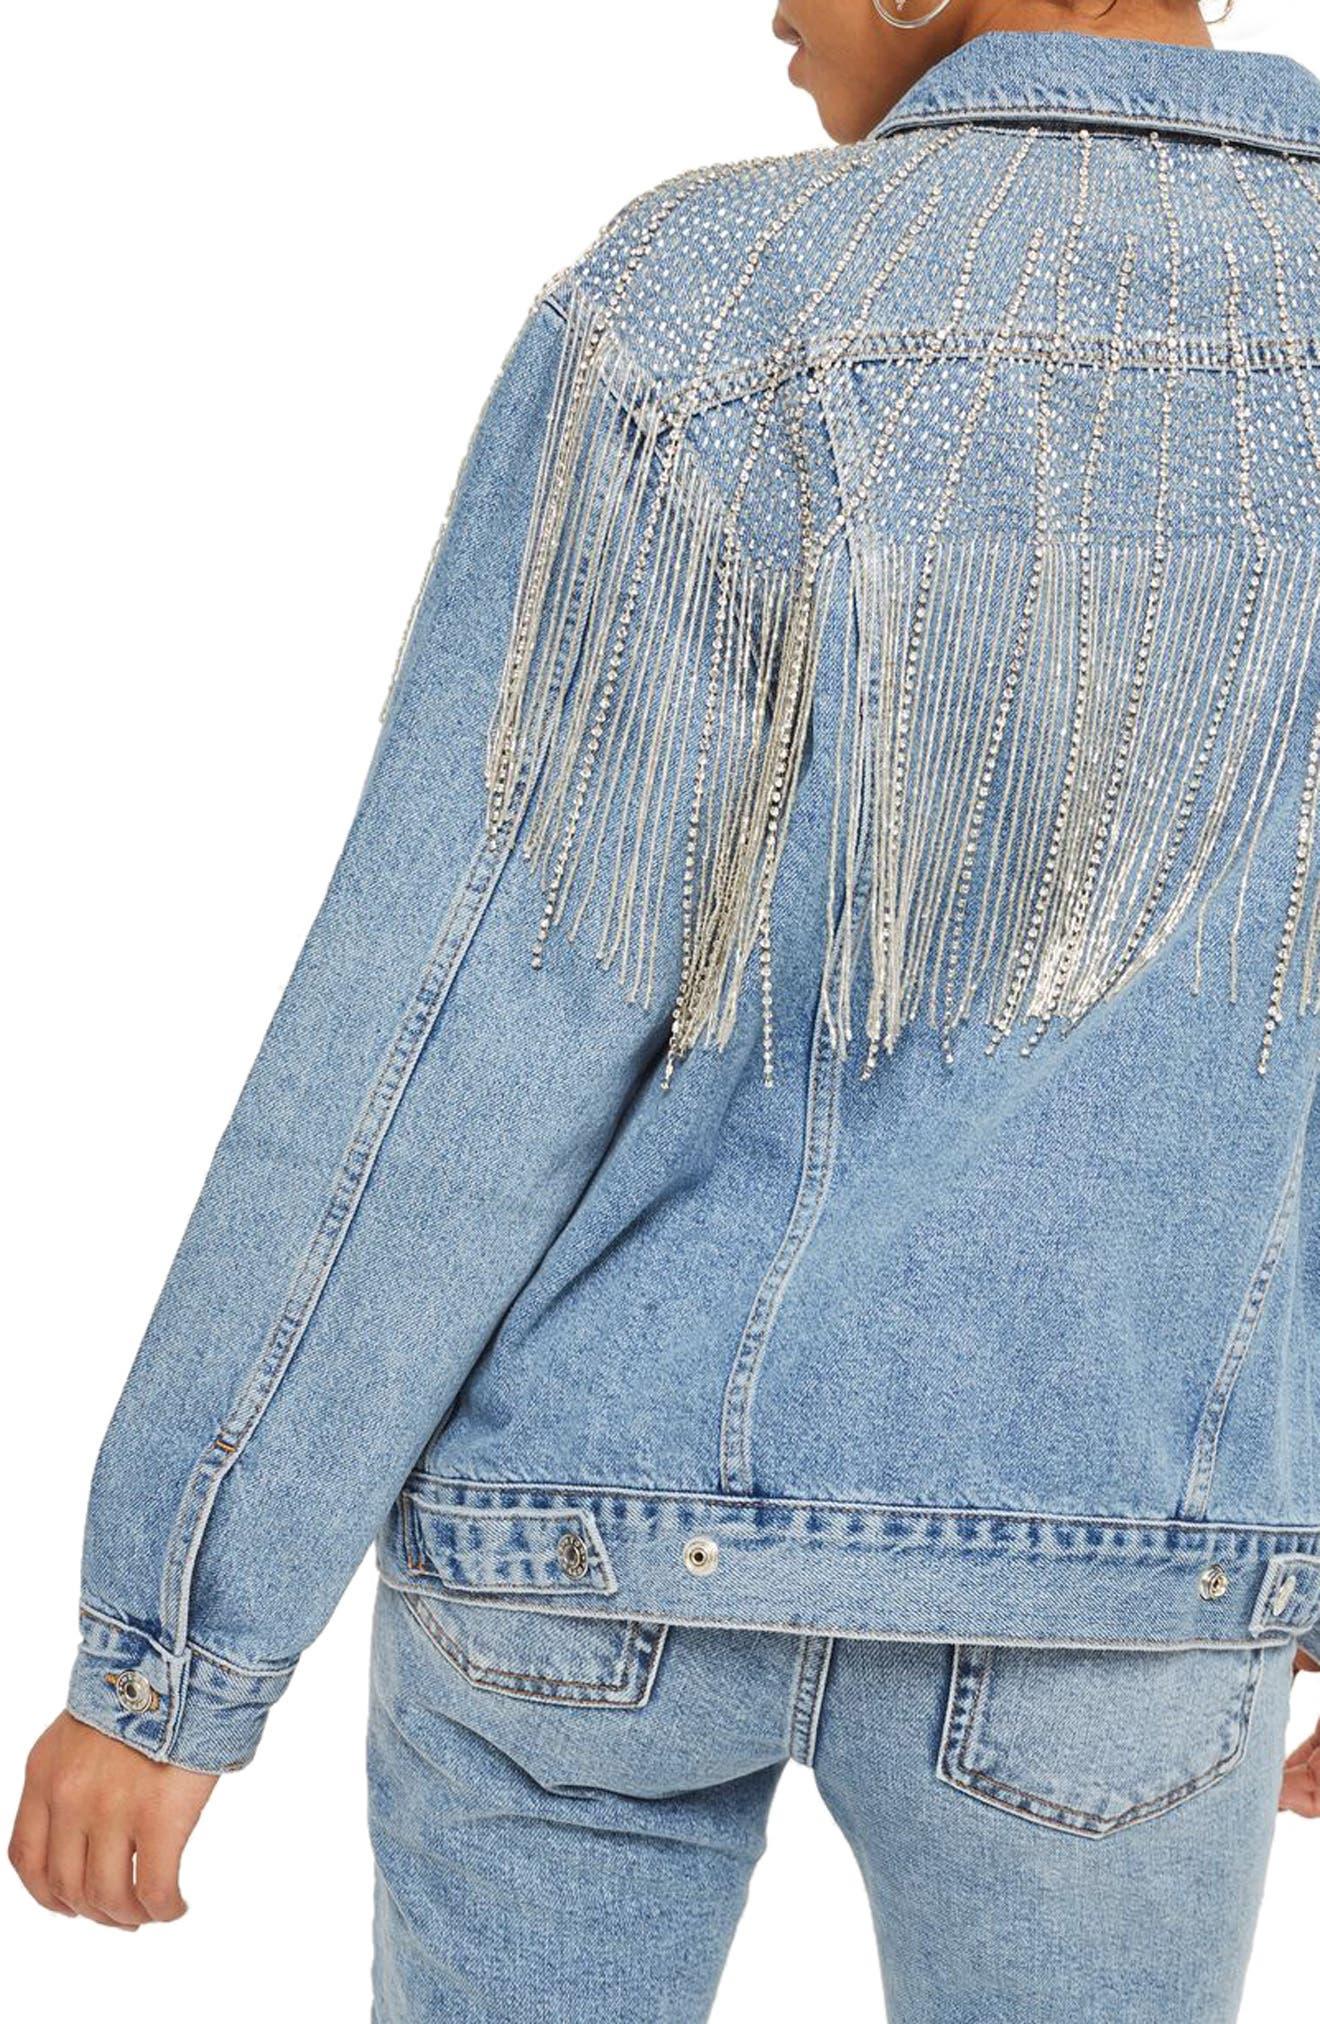 Dolly Sequin Fringe Denim Jacket,                             Alternate thumbnail 2, color,                             Mid Denim